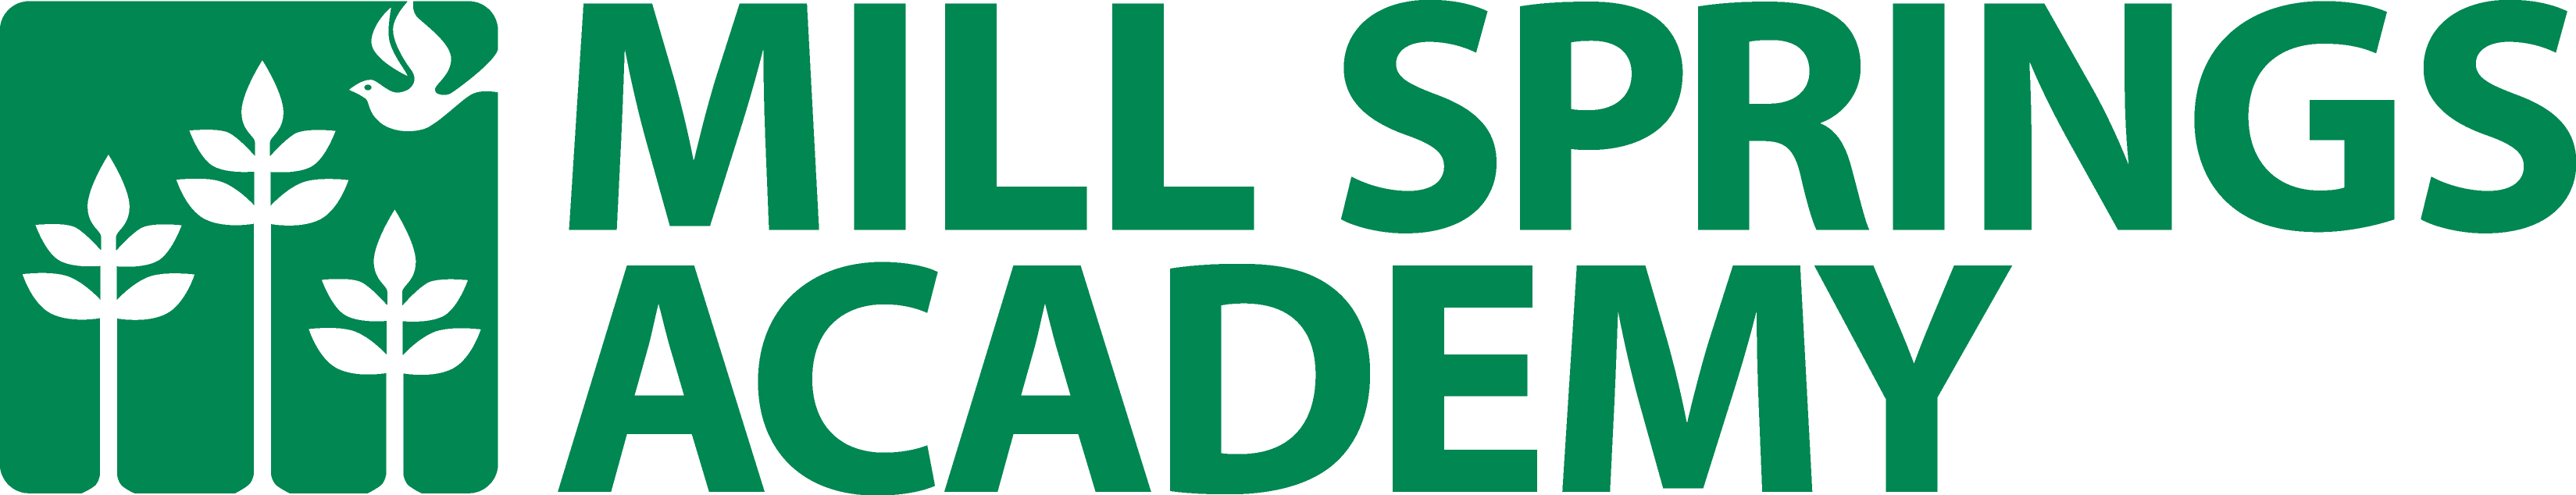 msa-logo.png